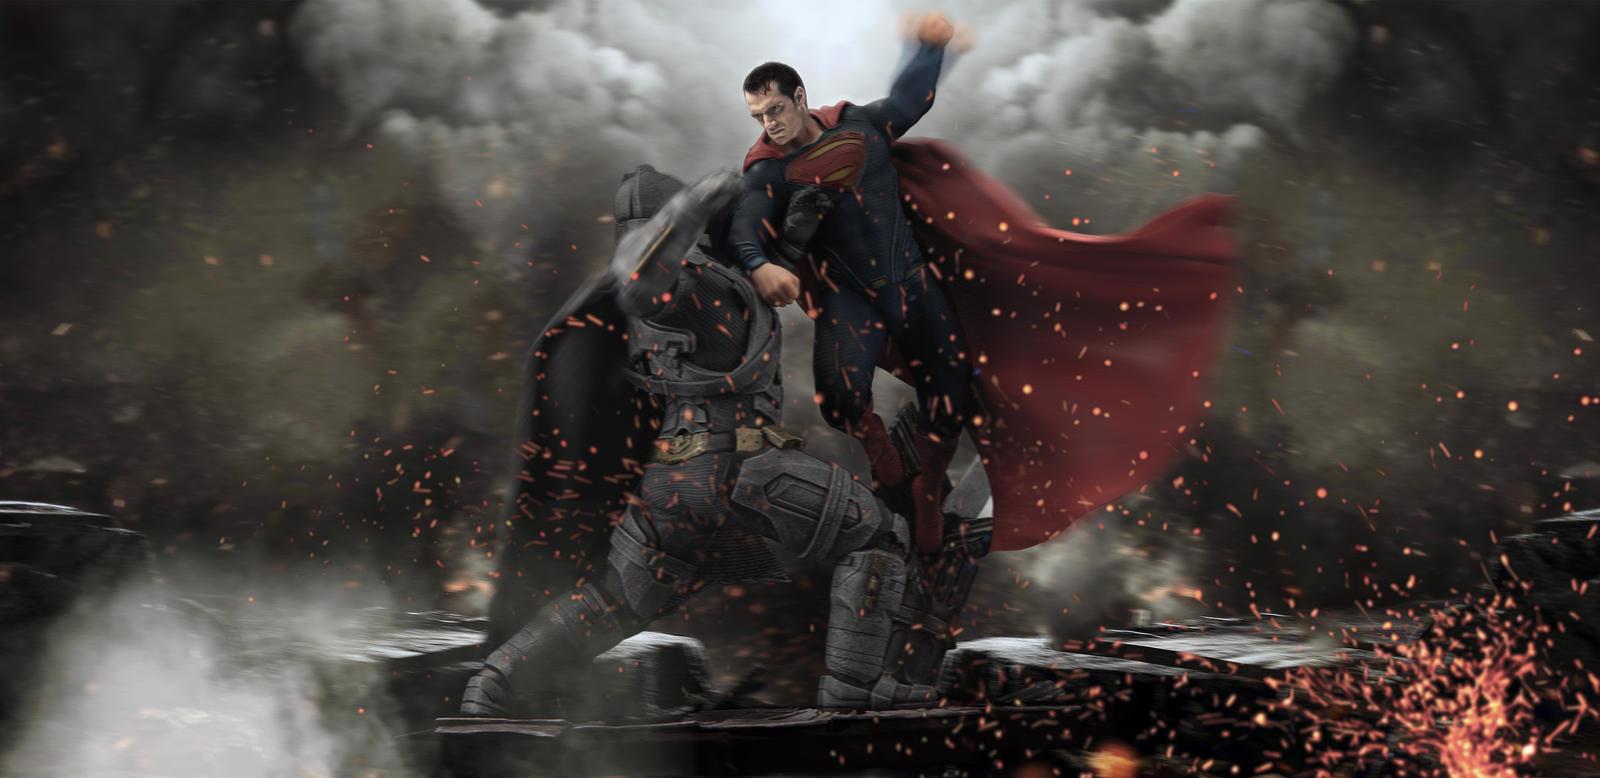 Batman V Superman Fight By DJ Prince Norway Djprincenorway